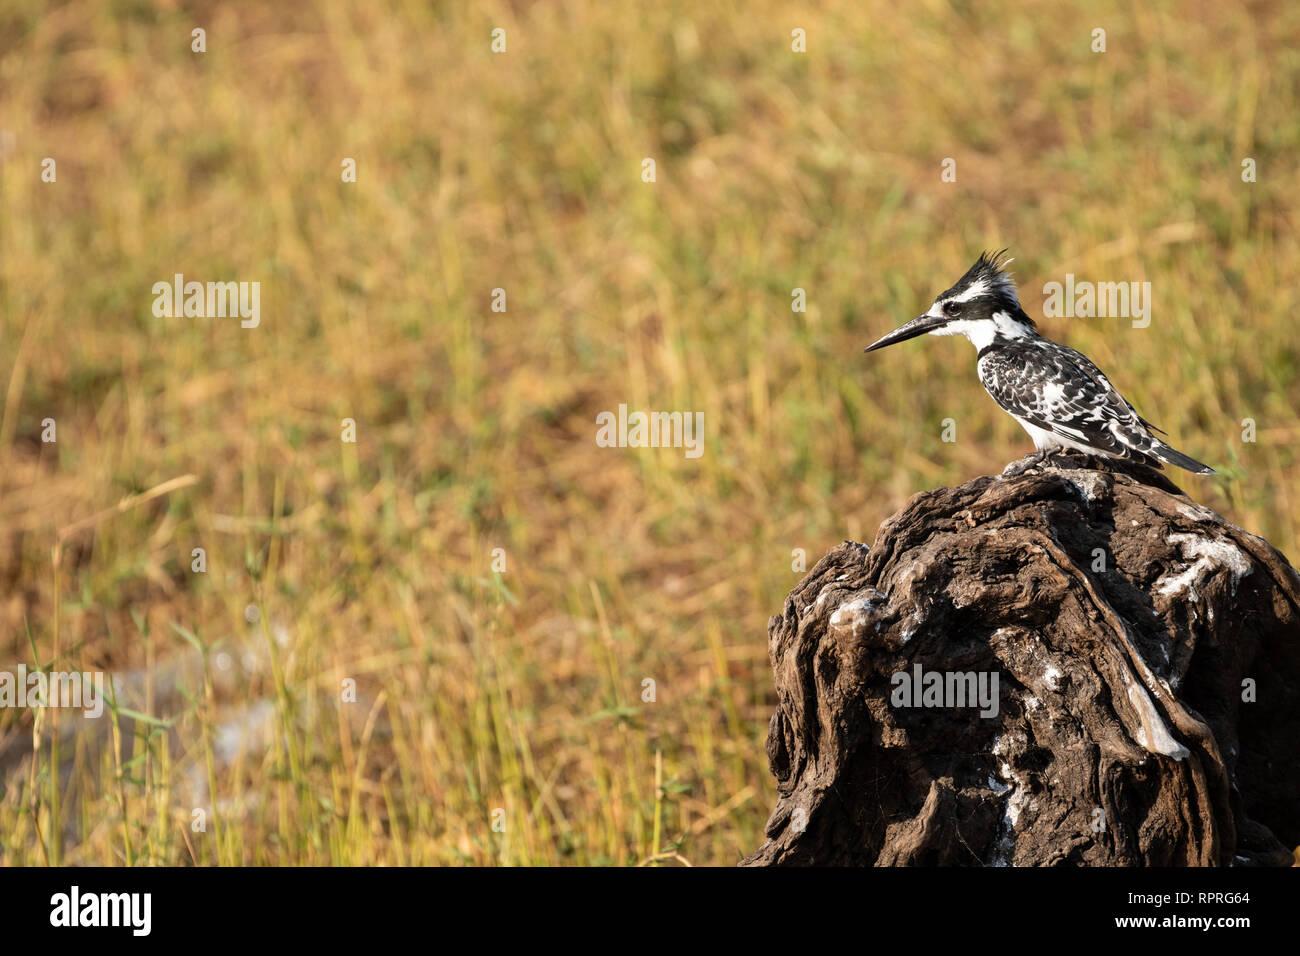 Chobe National Park in Botswana - Stock Image